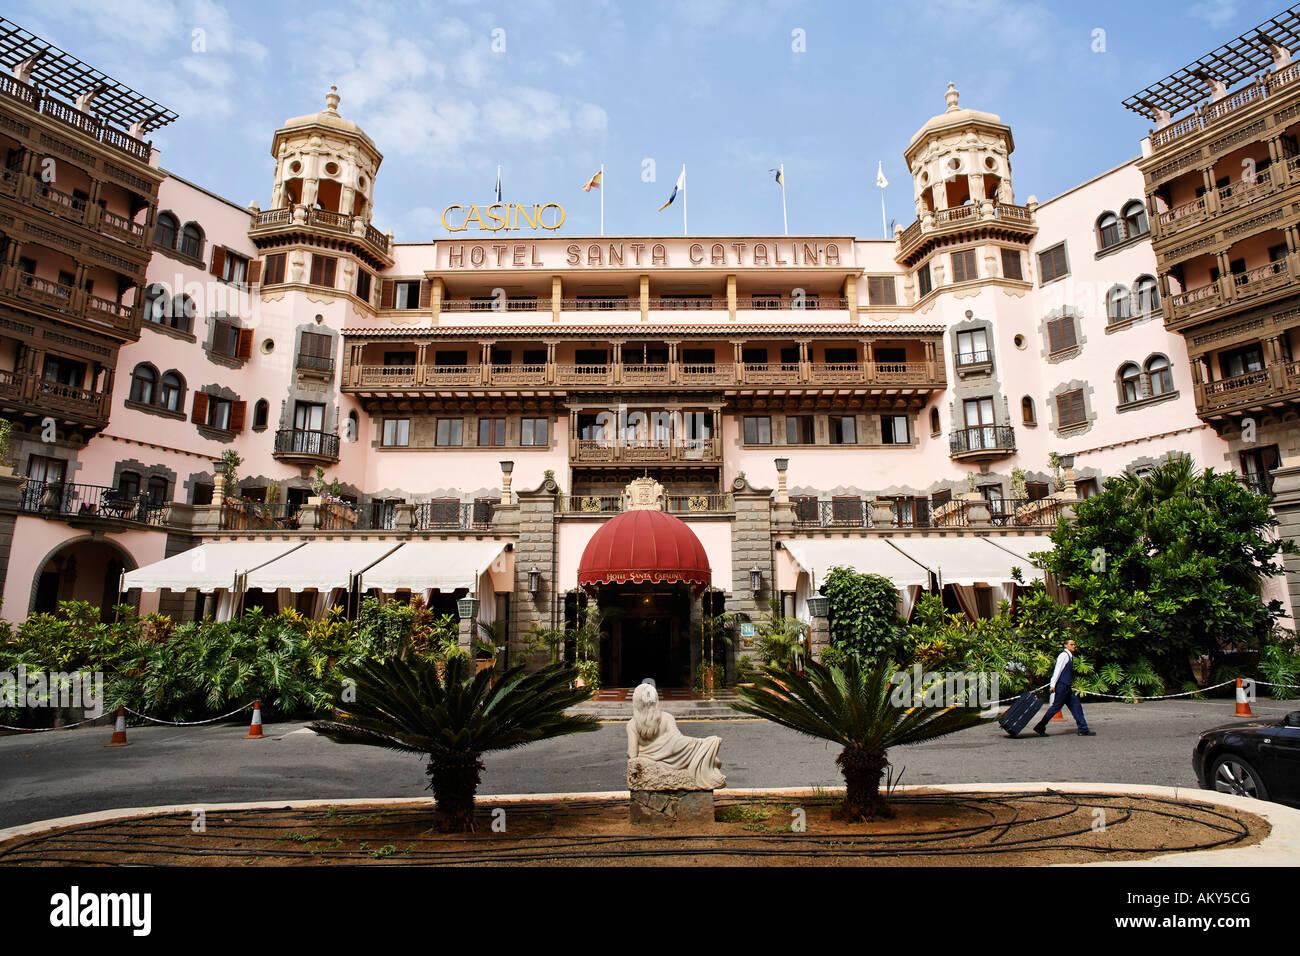 Santa Catalina Hotel Las Palmas Gran Canaria